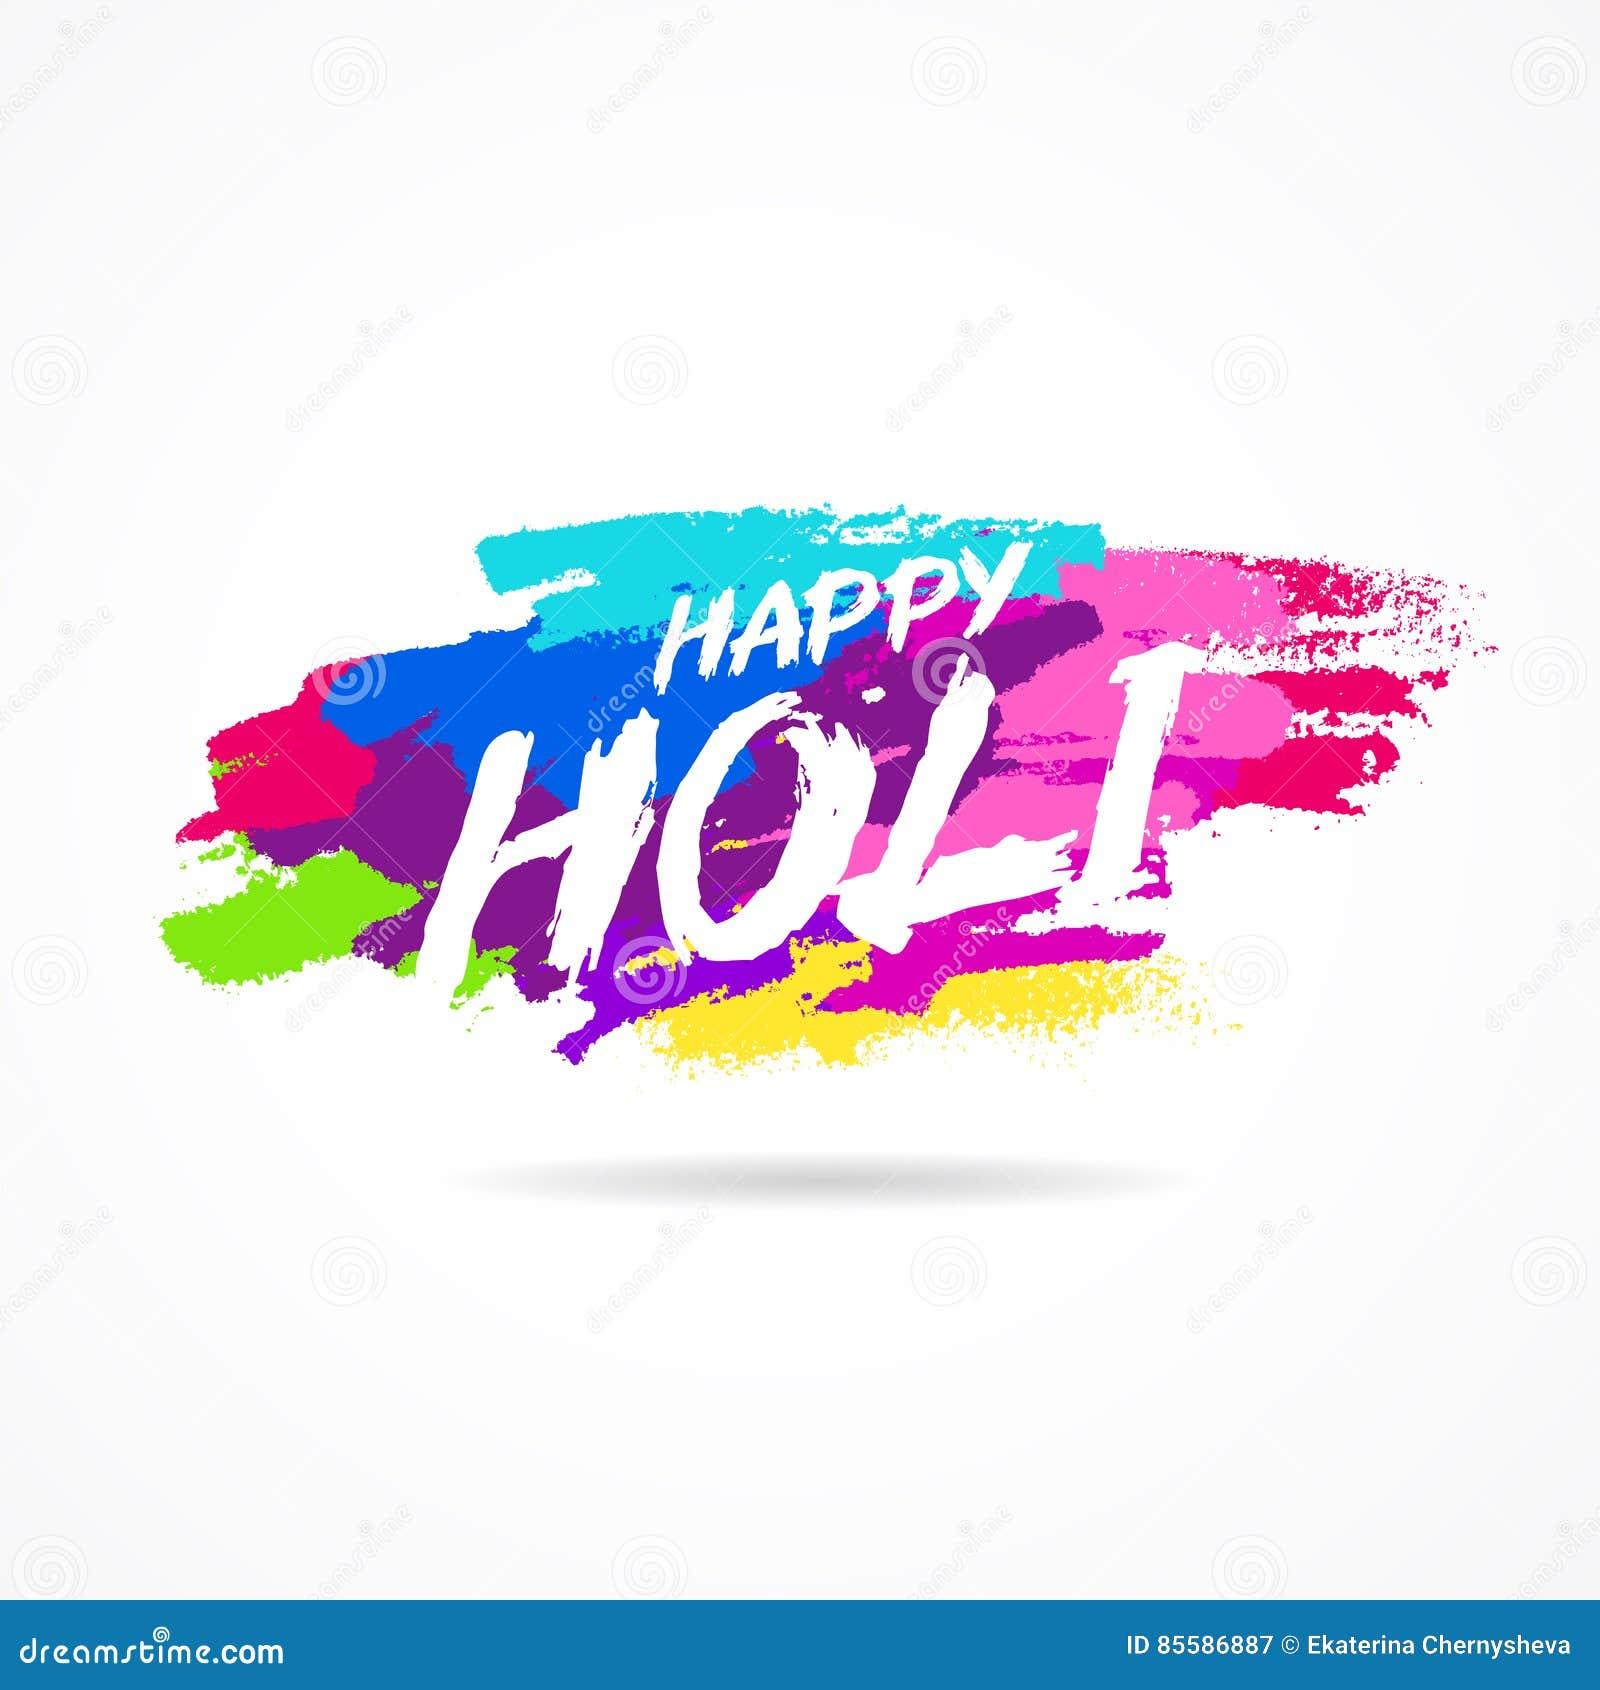 Happy Holi. Festival of colors